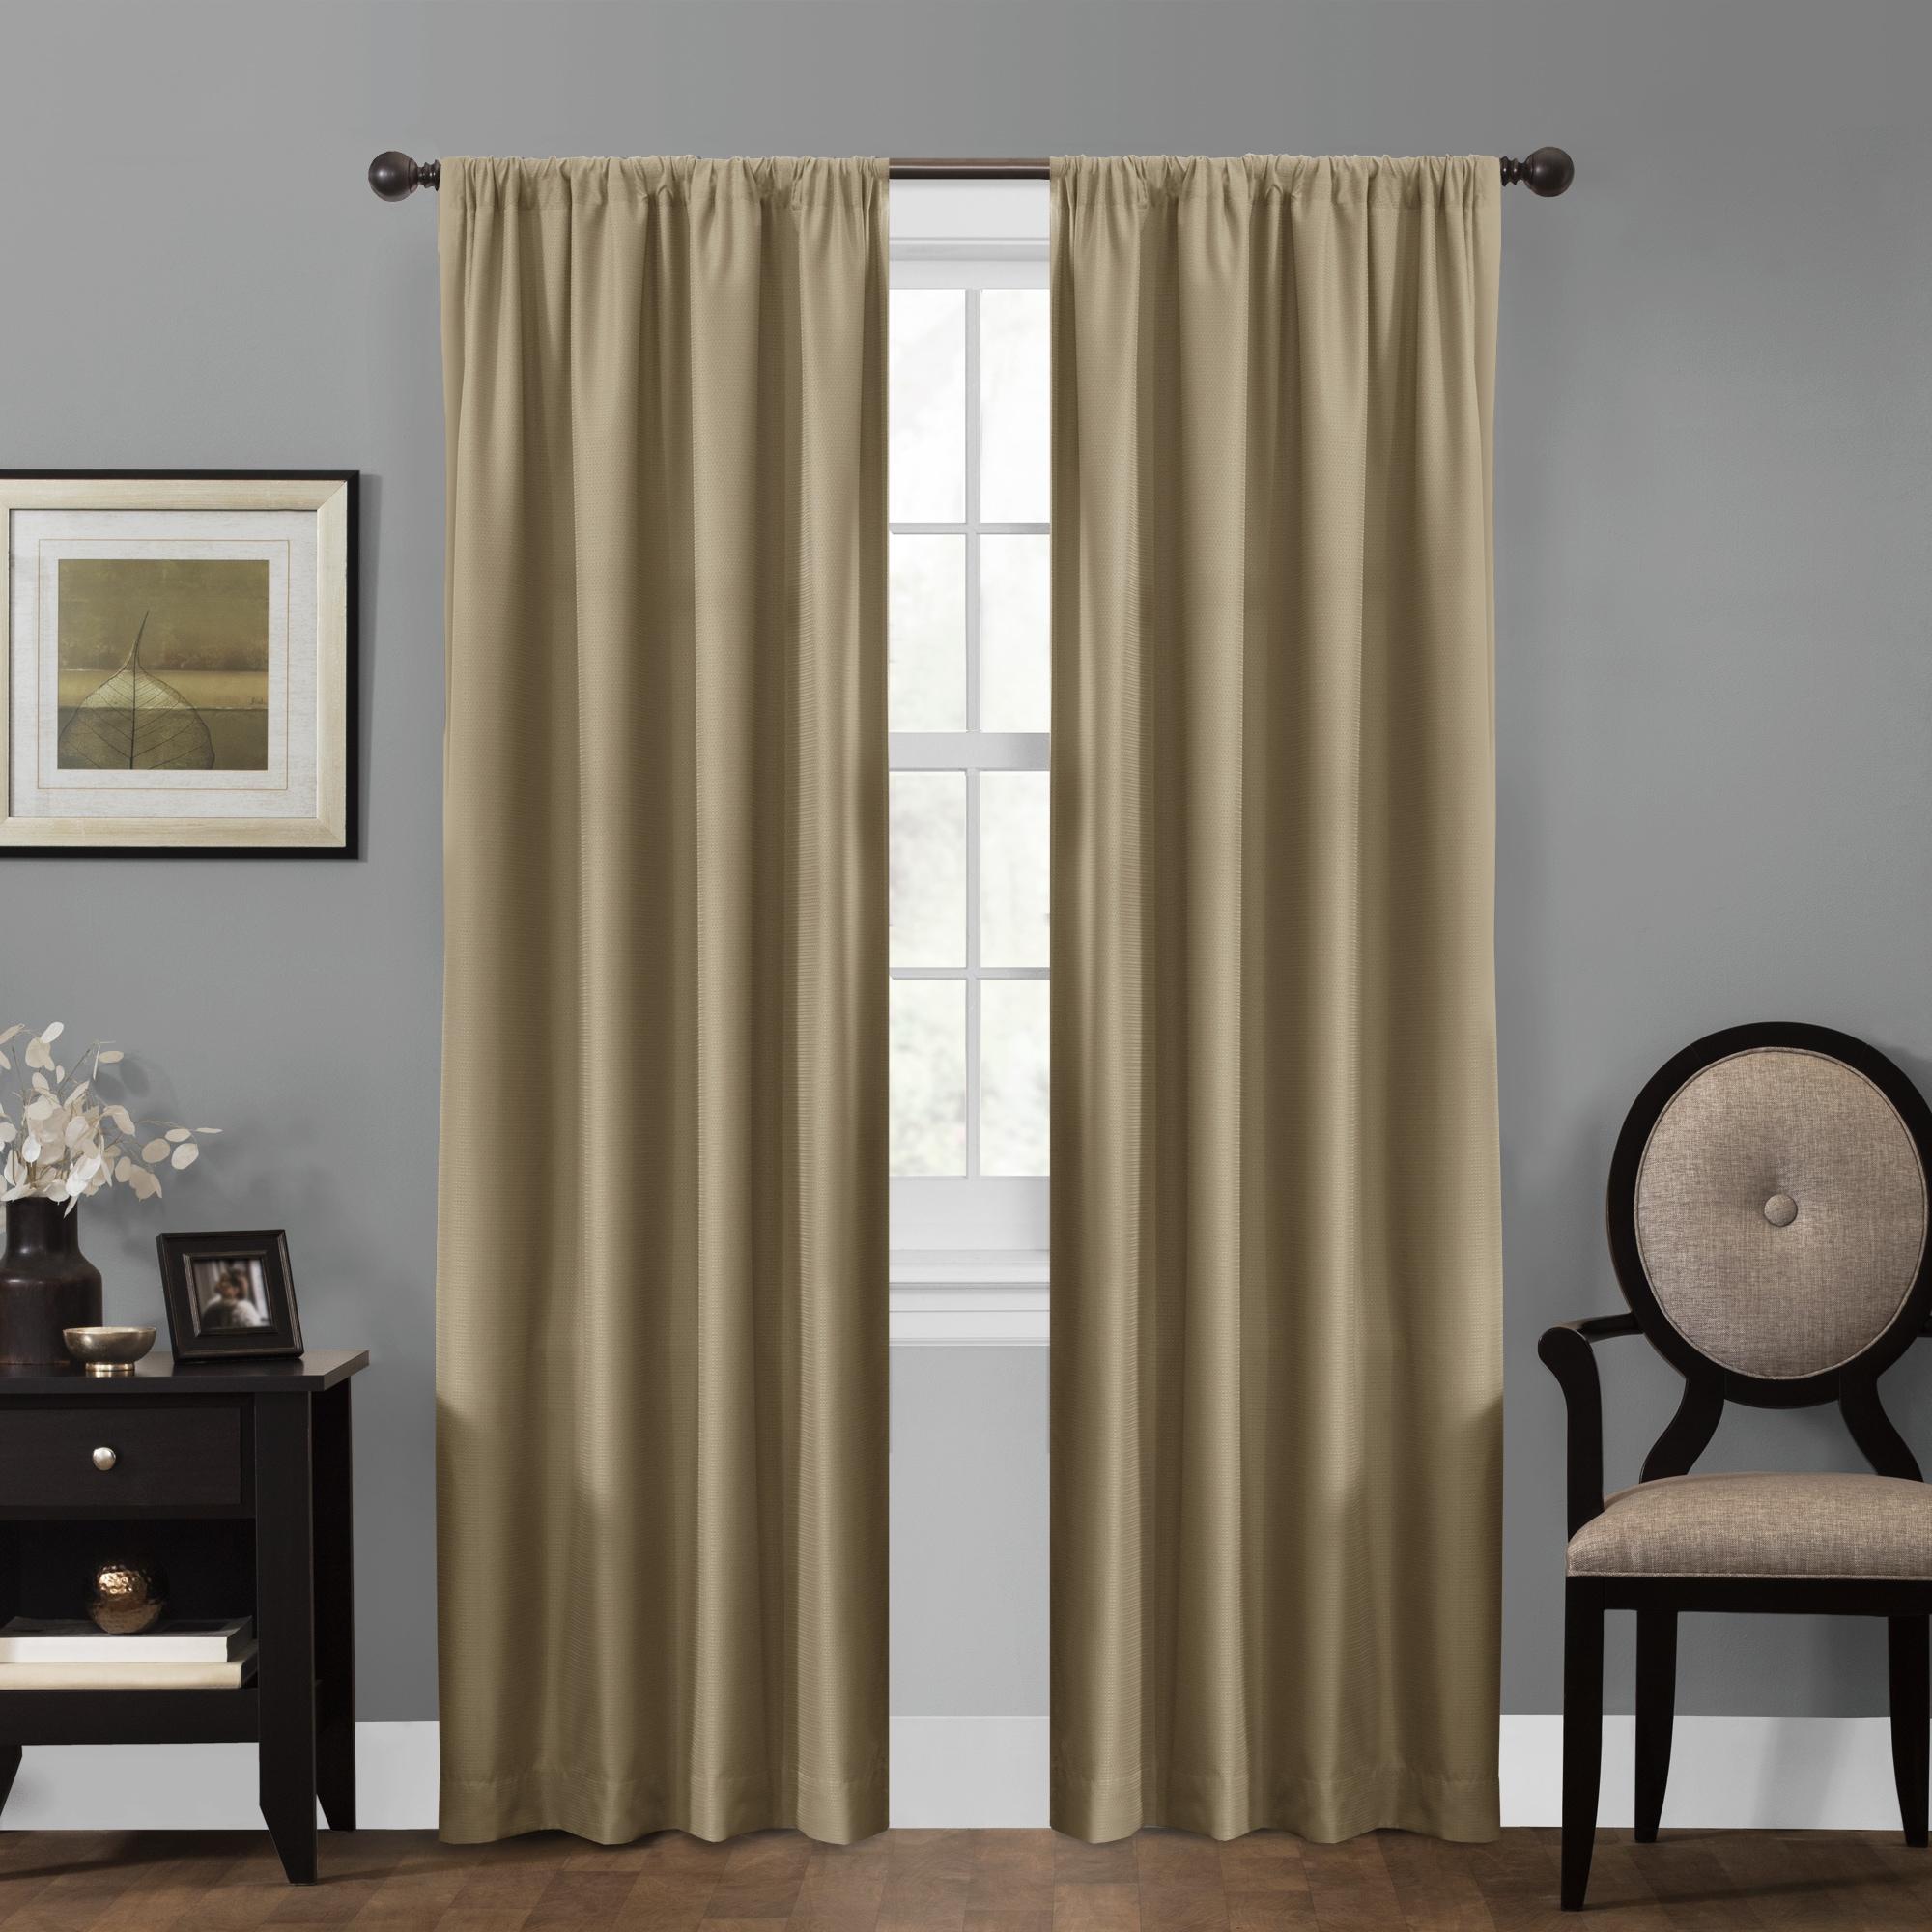 maytex smart curtains julius 100 percent blackout window curtain panel 50 x 84 ebay. Black Bedroom Furniture Sets. Home Design Ideas